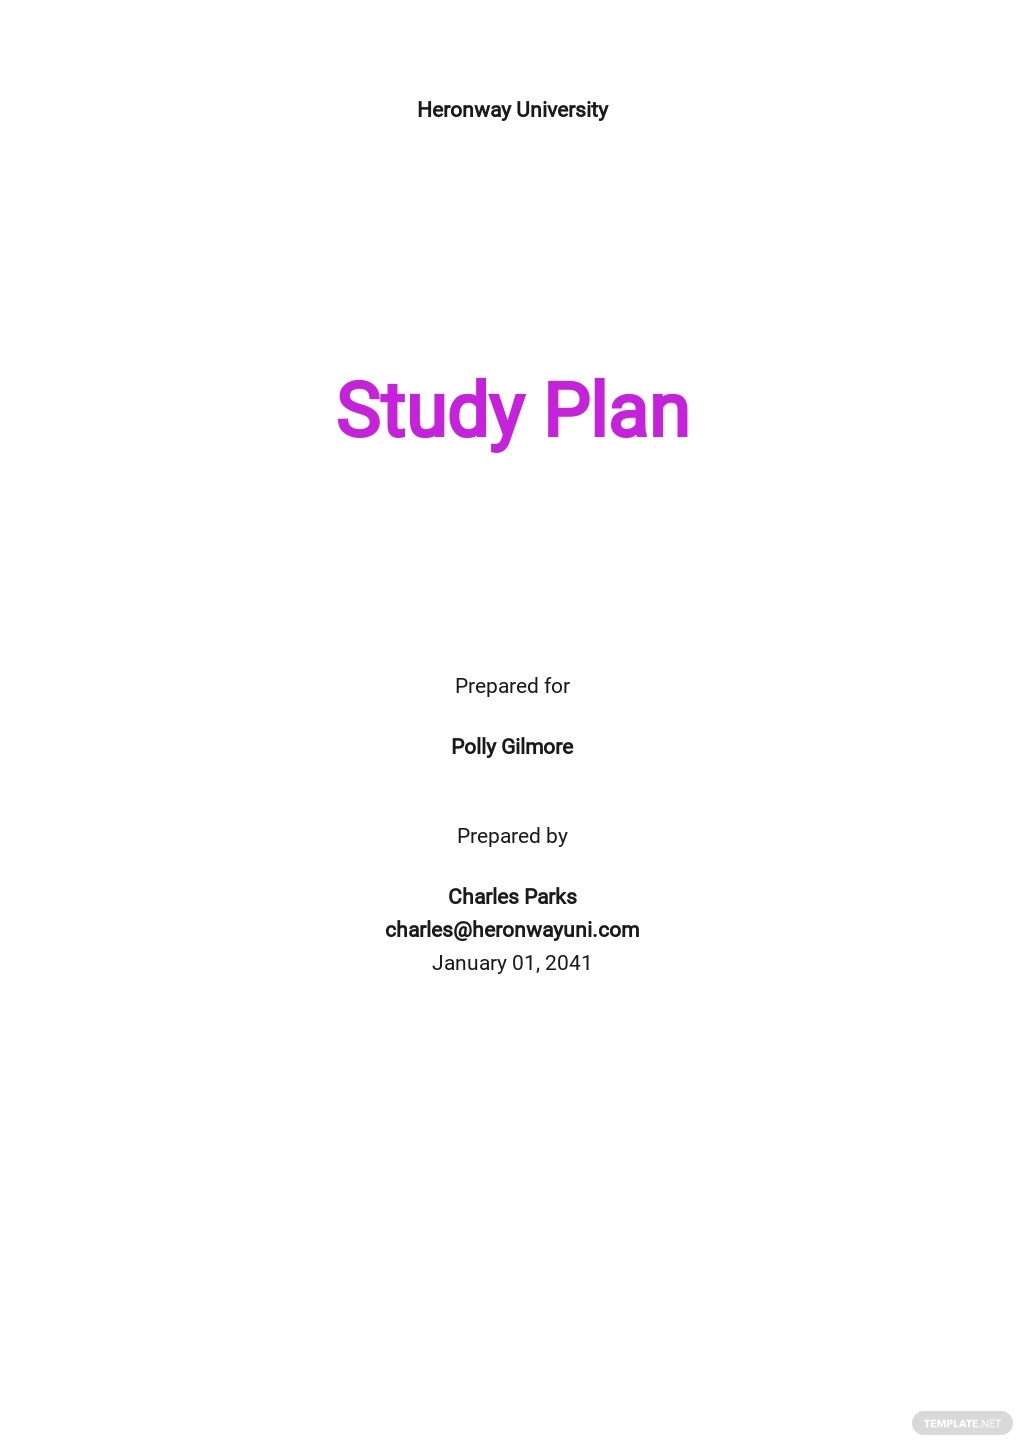 University Study Plan Template.jpe